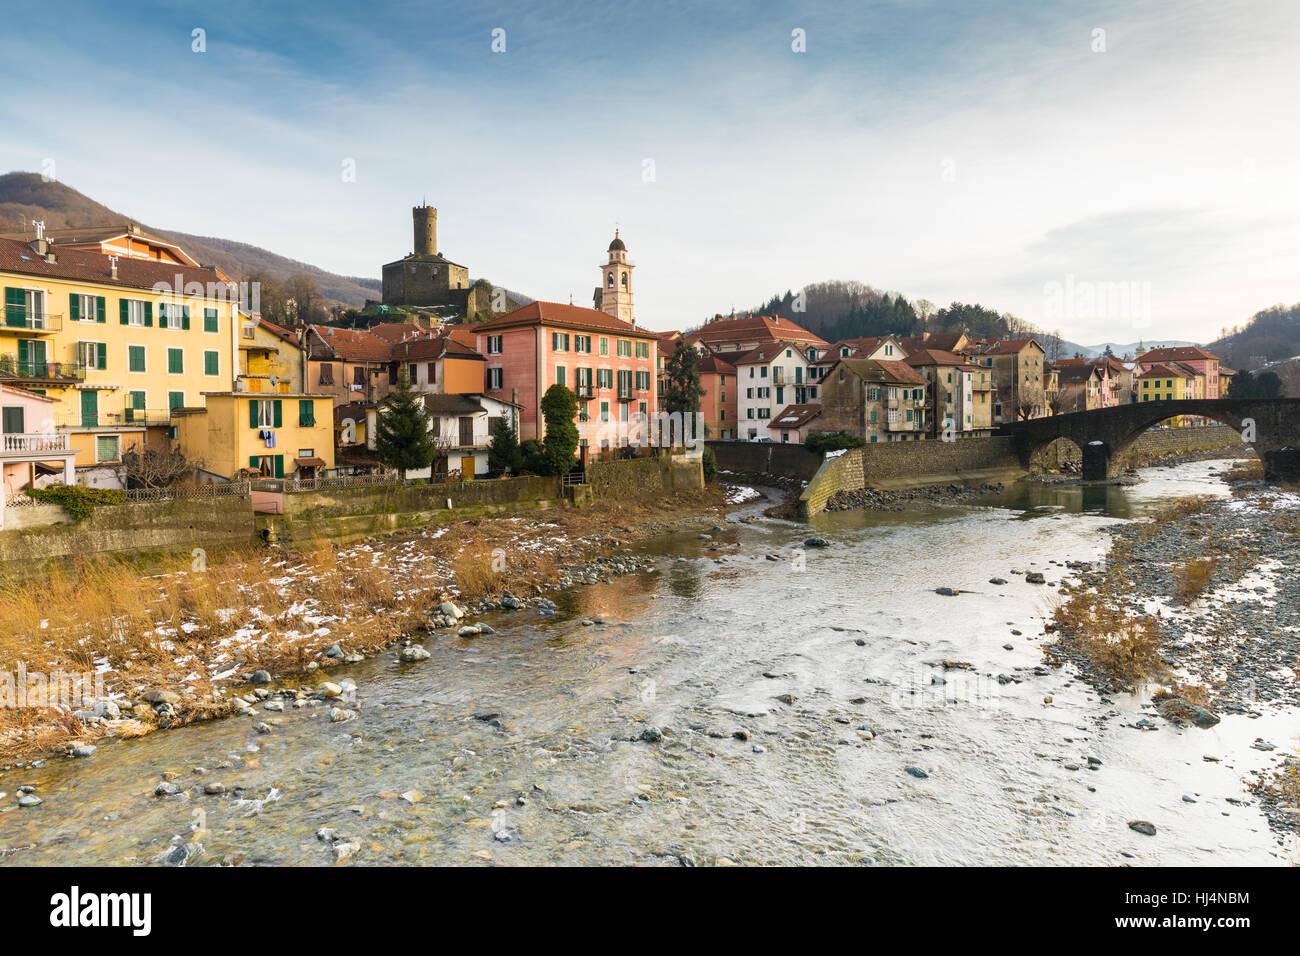 The village of Campo Ligure Genova Italy Stock Photo